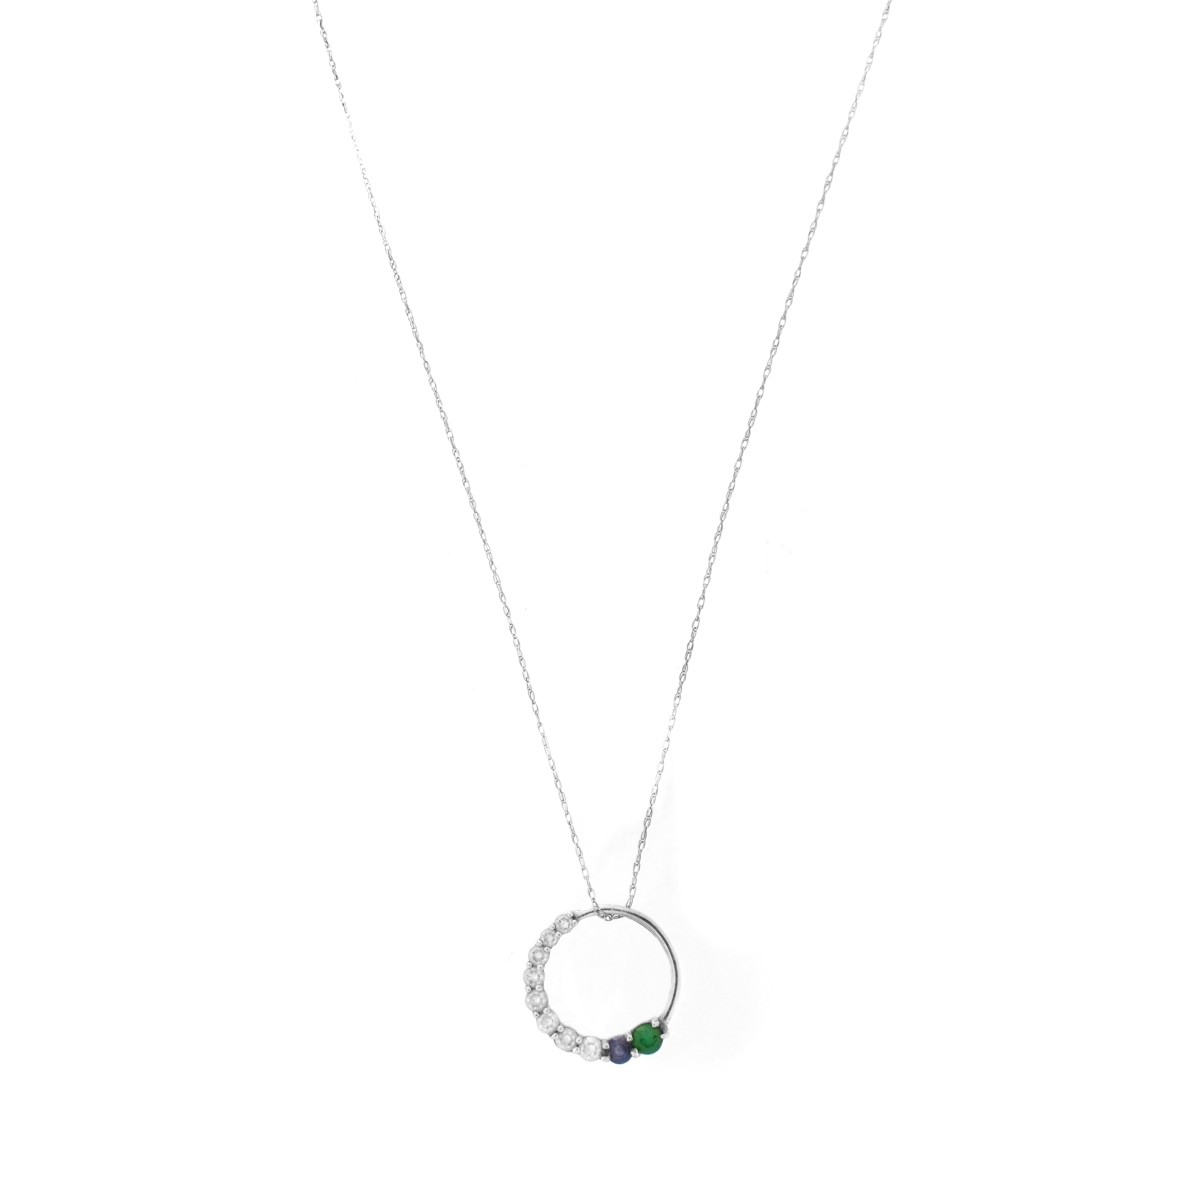 Lot 101 - Diamond, Gemstone and 14K Pendant Necklace